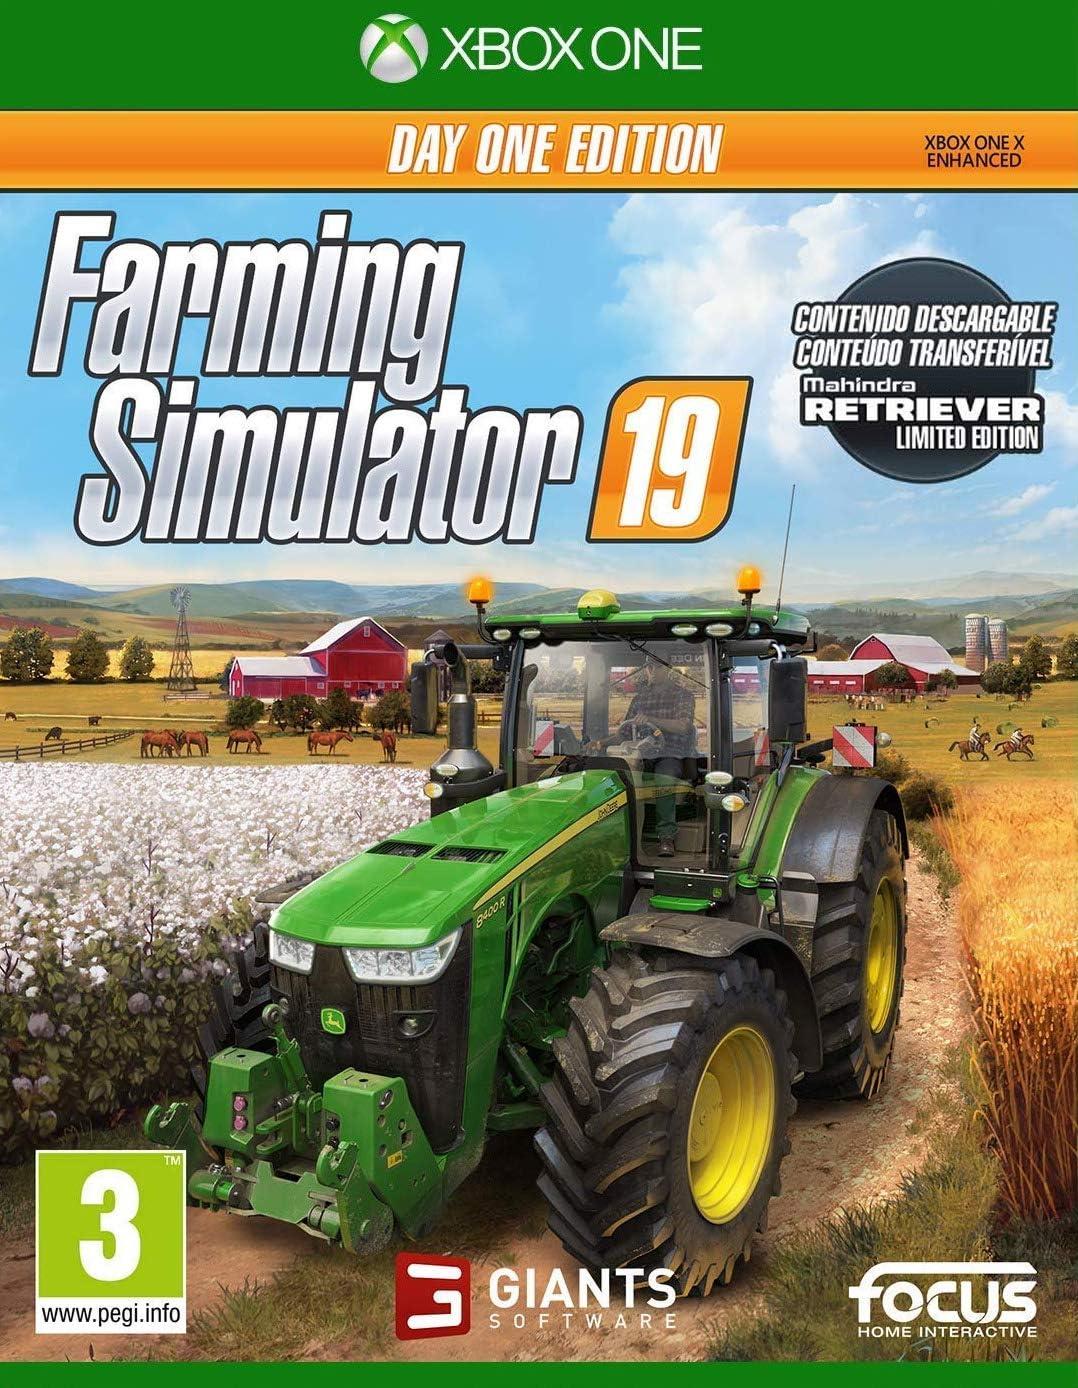 Farming Simulator 19 Day One Edition (Xbox One): Amazon.es: Videojuegos